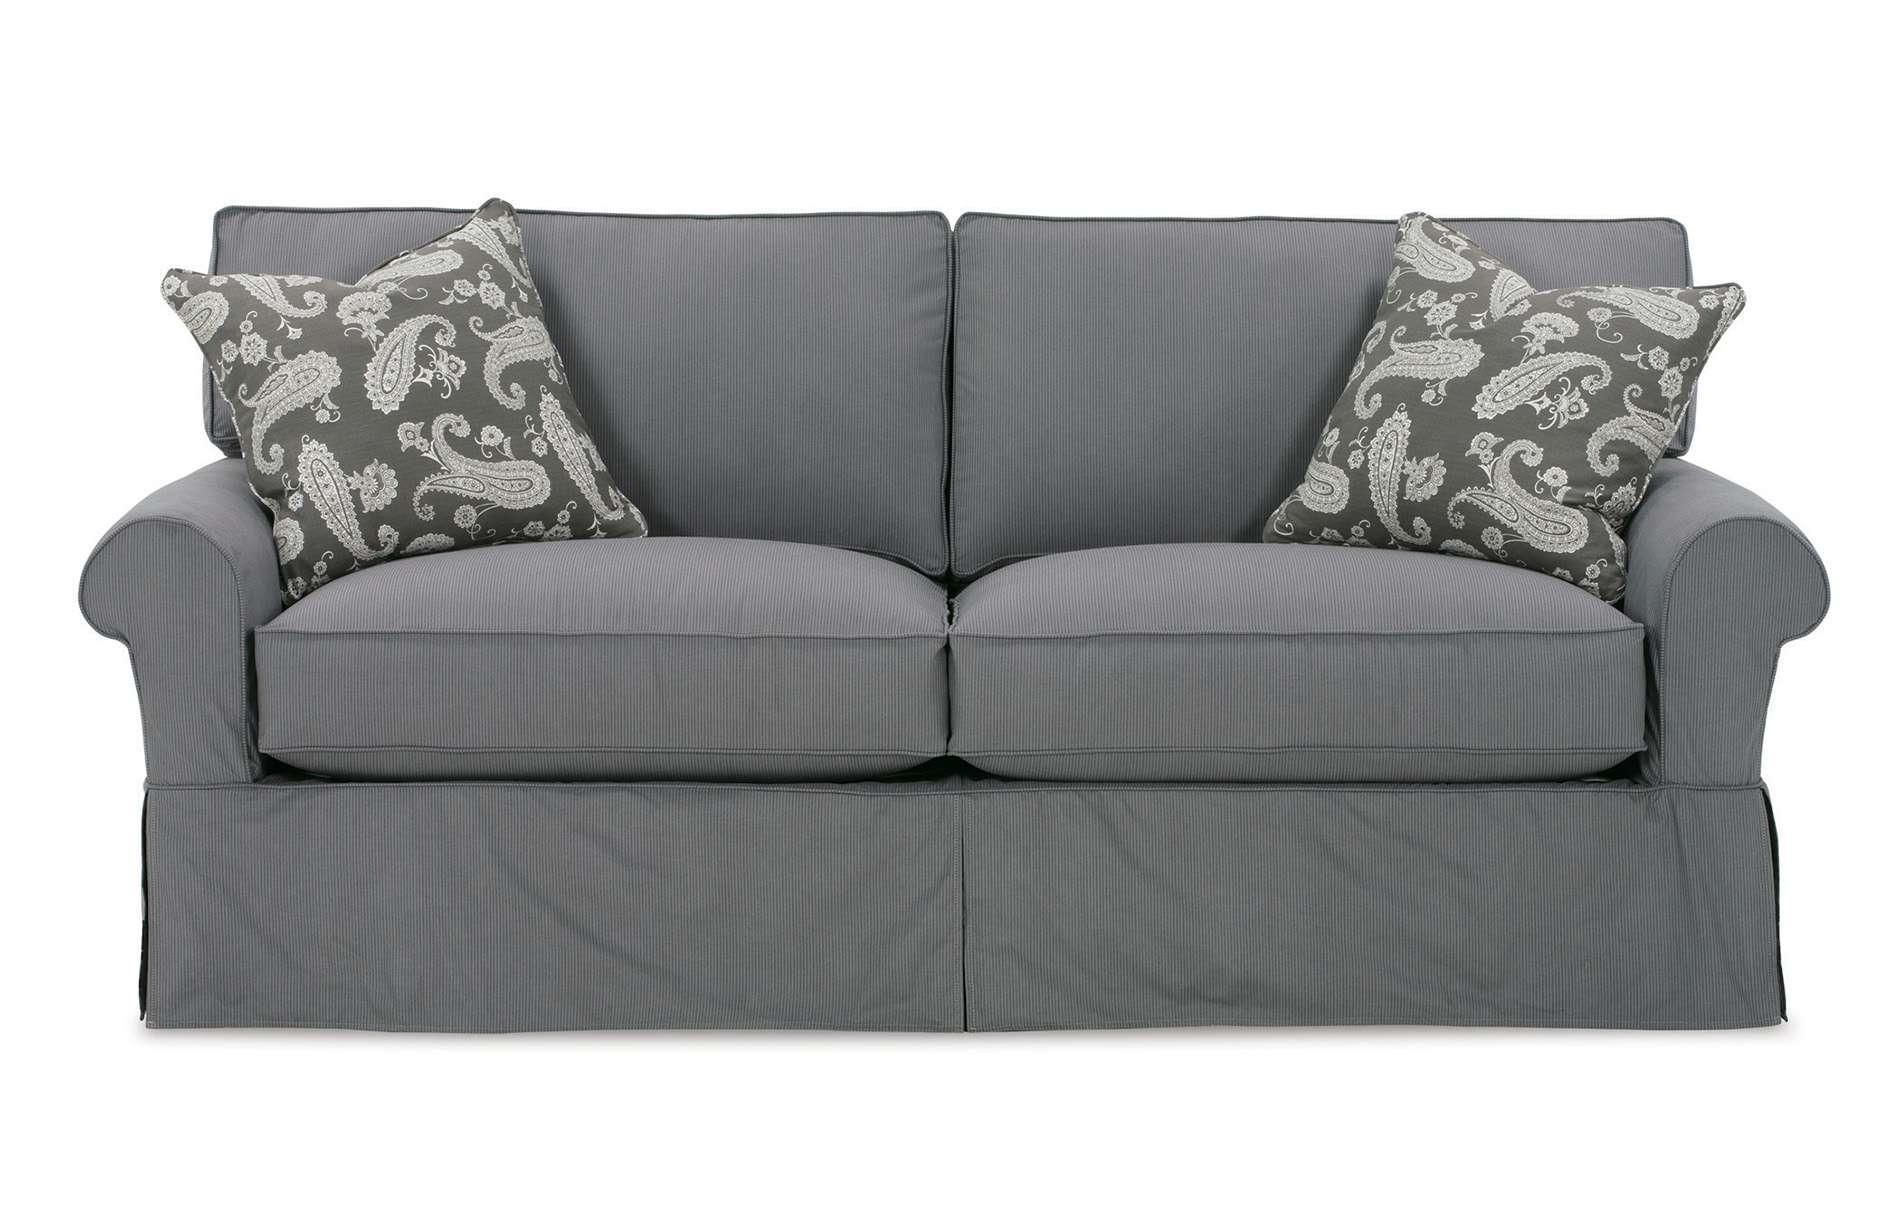 Queen Sleeper Sofa Slipcover - Tourdecarroll regarding King Size Sleeper Sofa Sectional